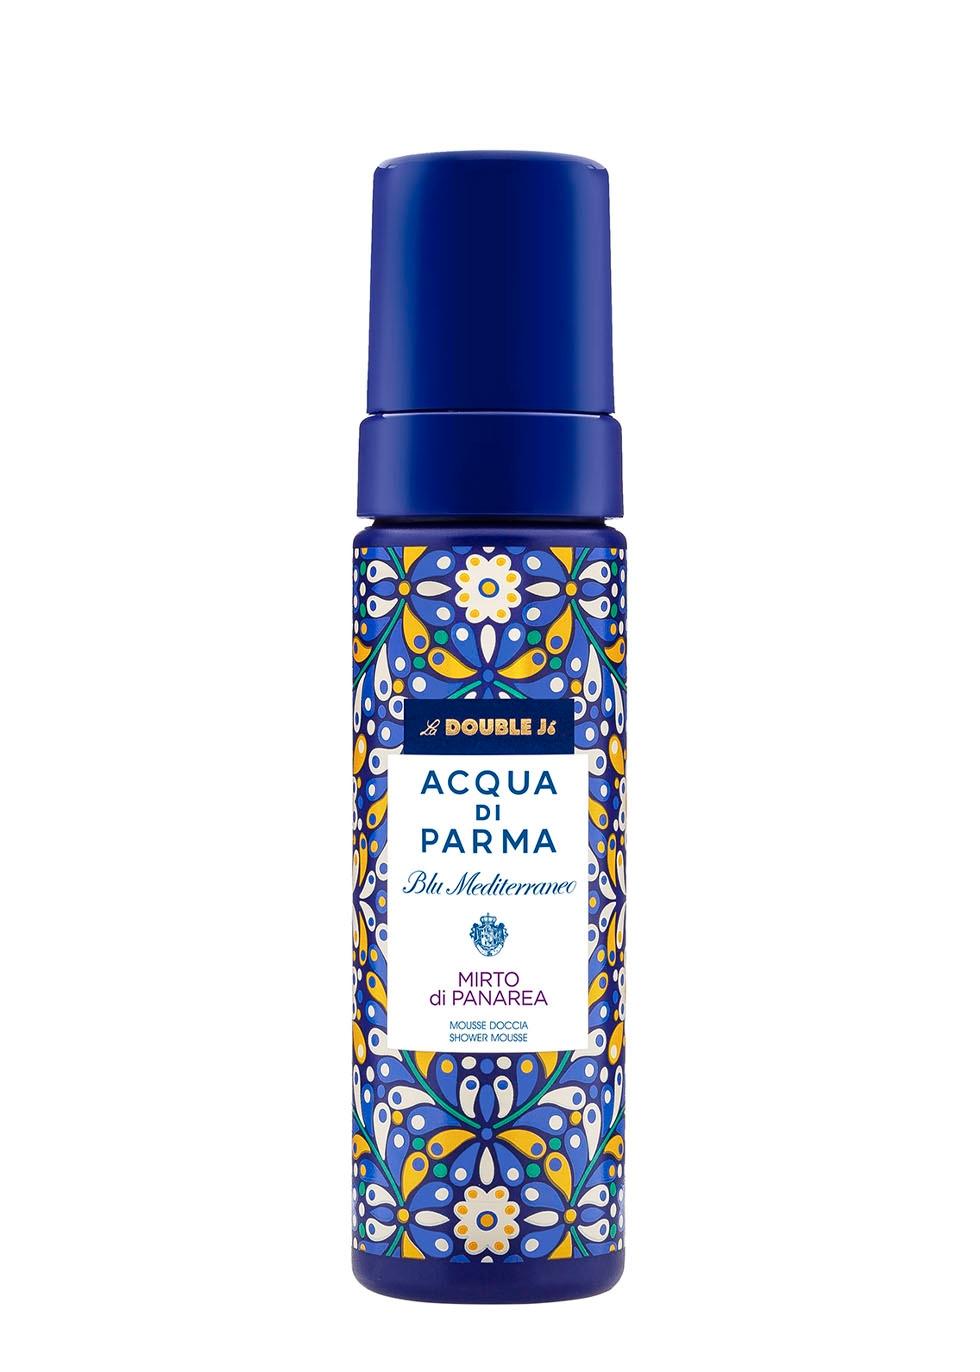 Blu Mediterraneo Mirto di Panarea Shower Mousse 150ml